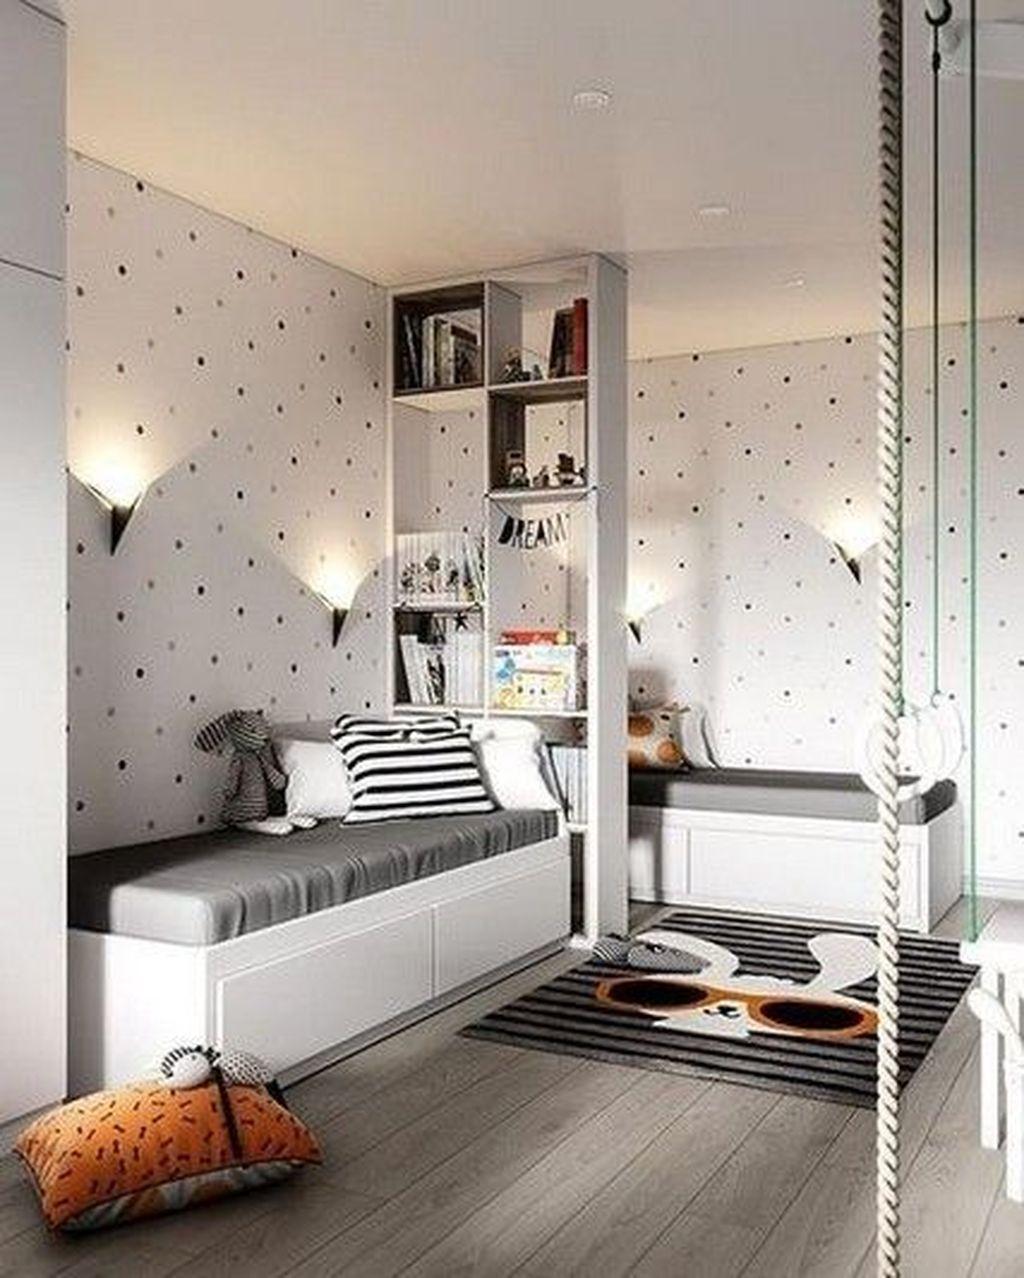 49 Impressive Diy Small Bedroom Decoration Ideas On A